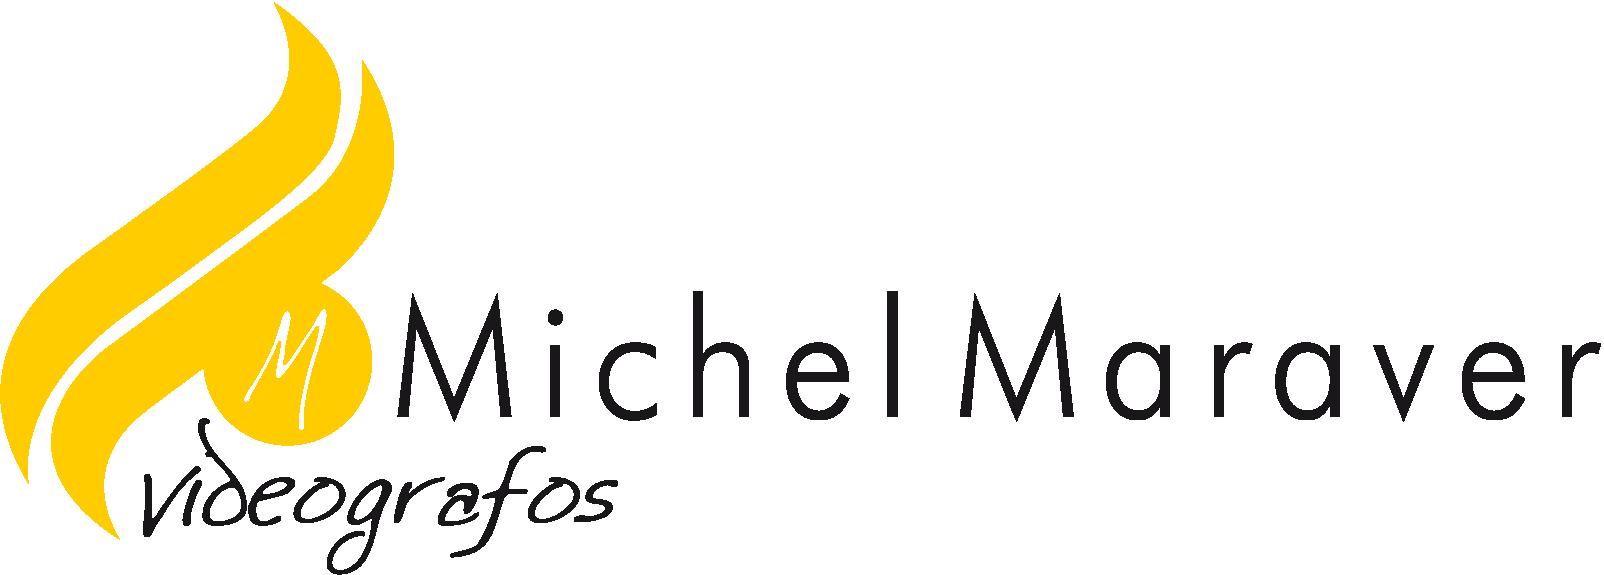 Michel Maraver Videógrafos